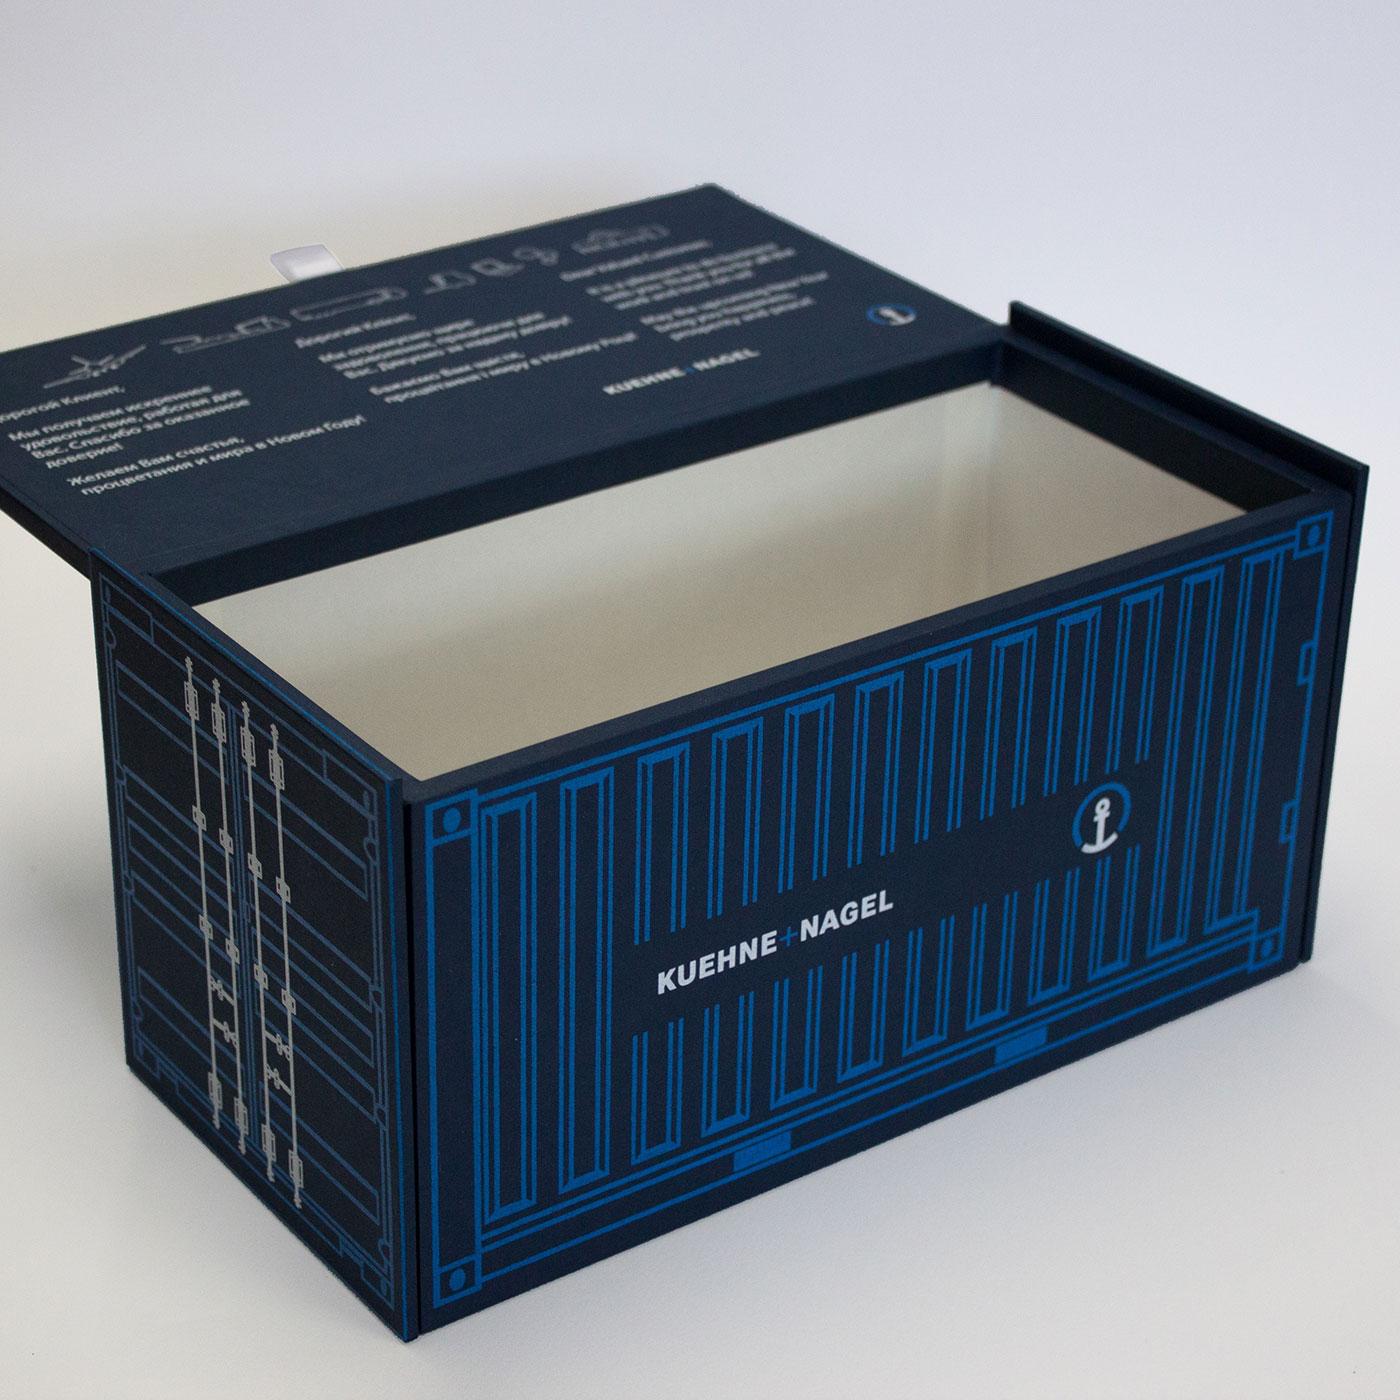 Коробка шкатулка в виде морского контейнера